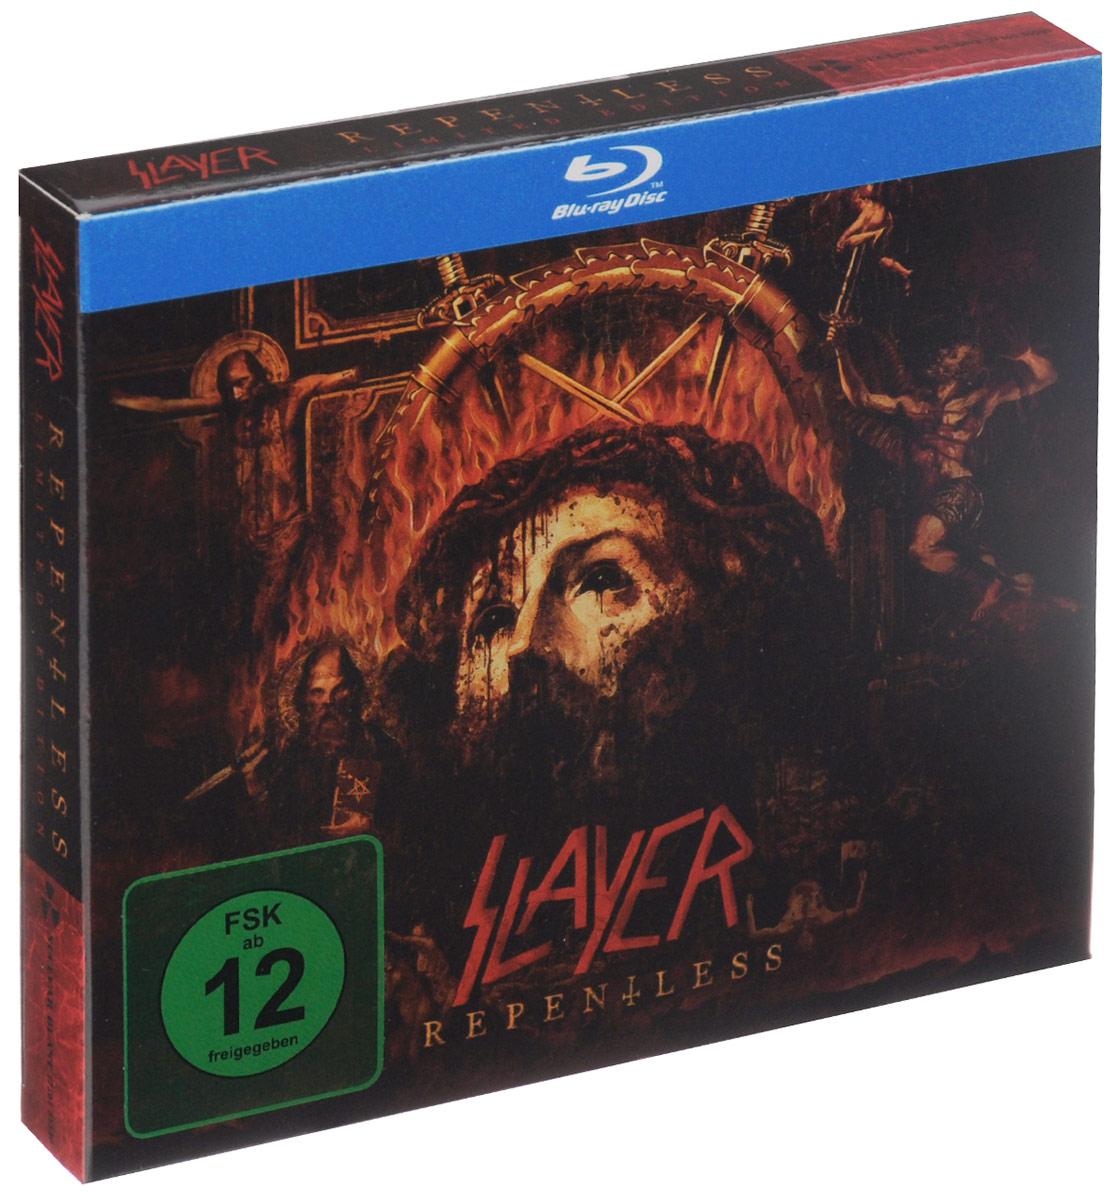 """Slayer"" Slayer. Repentless. Limited Edition (CD + Blu-ray)"